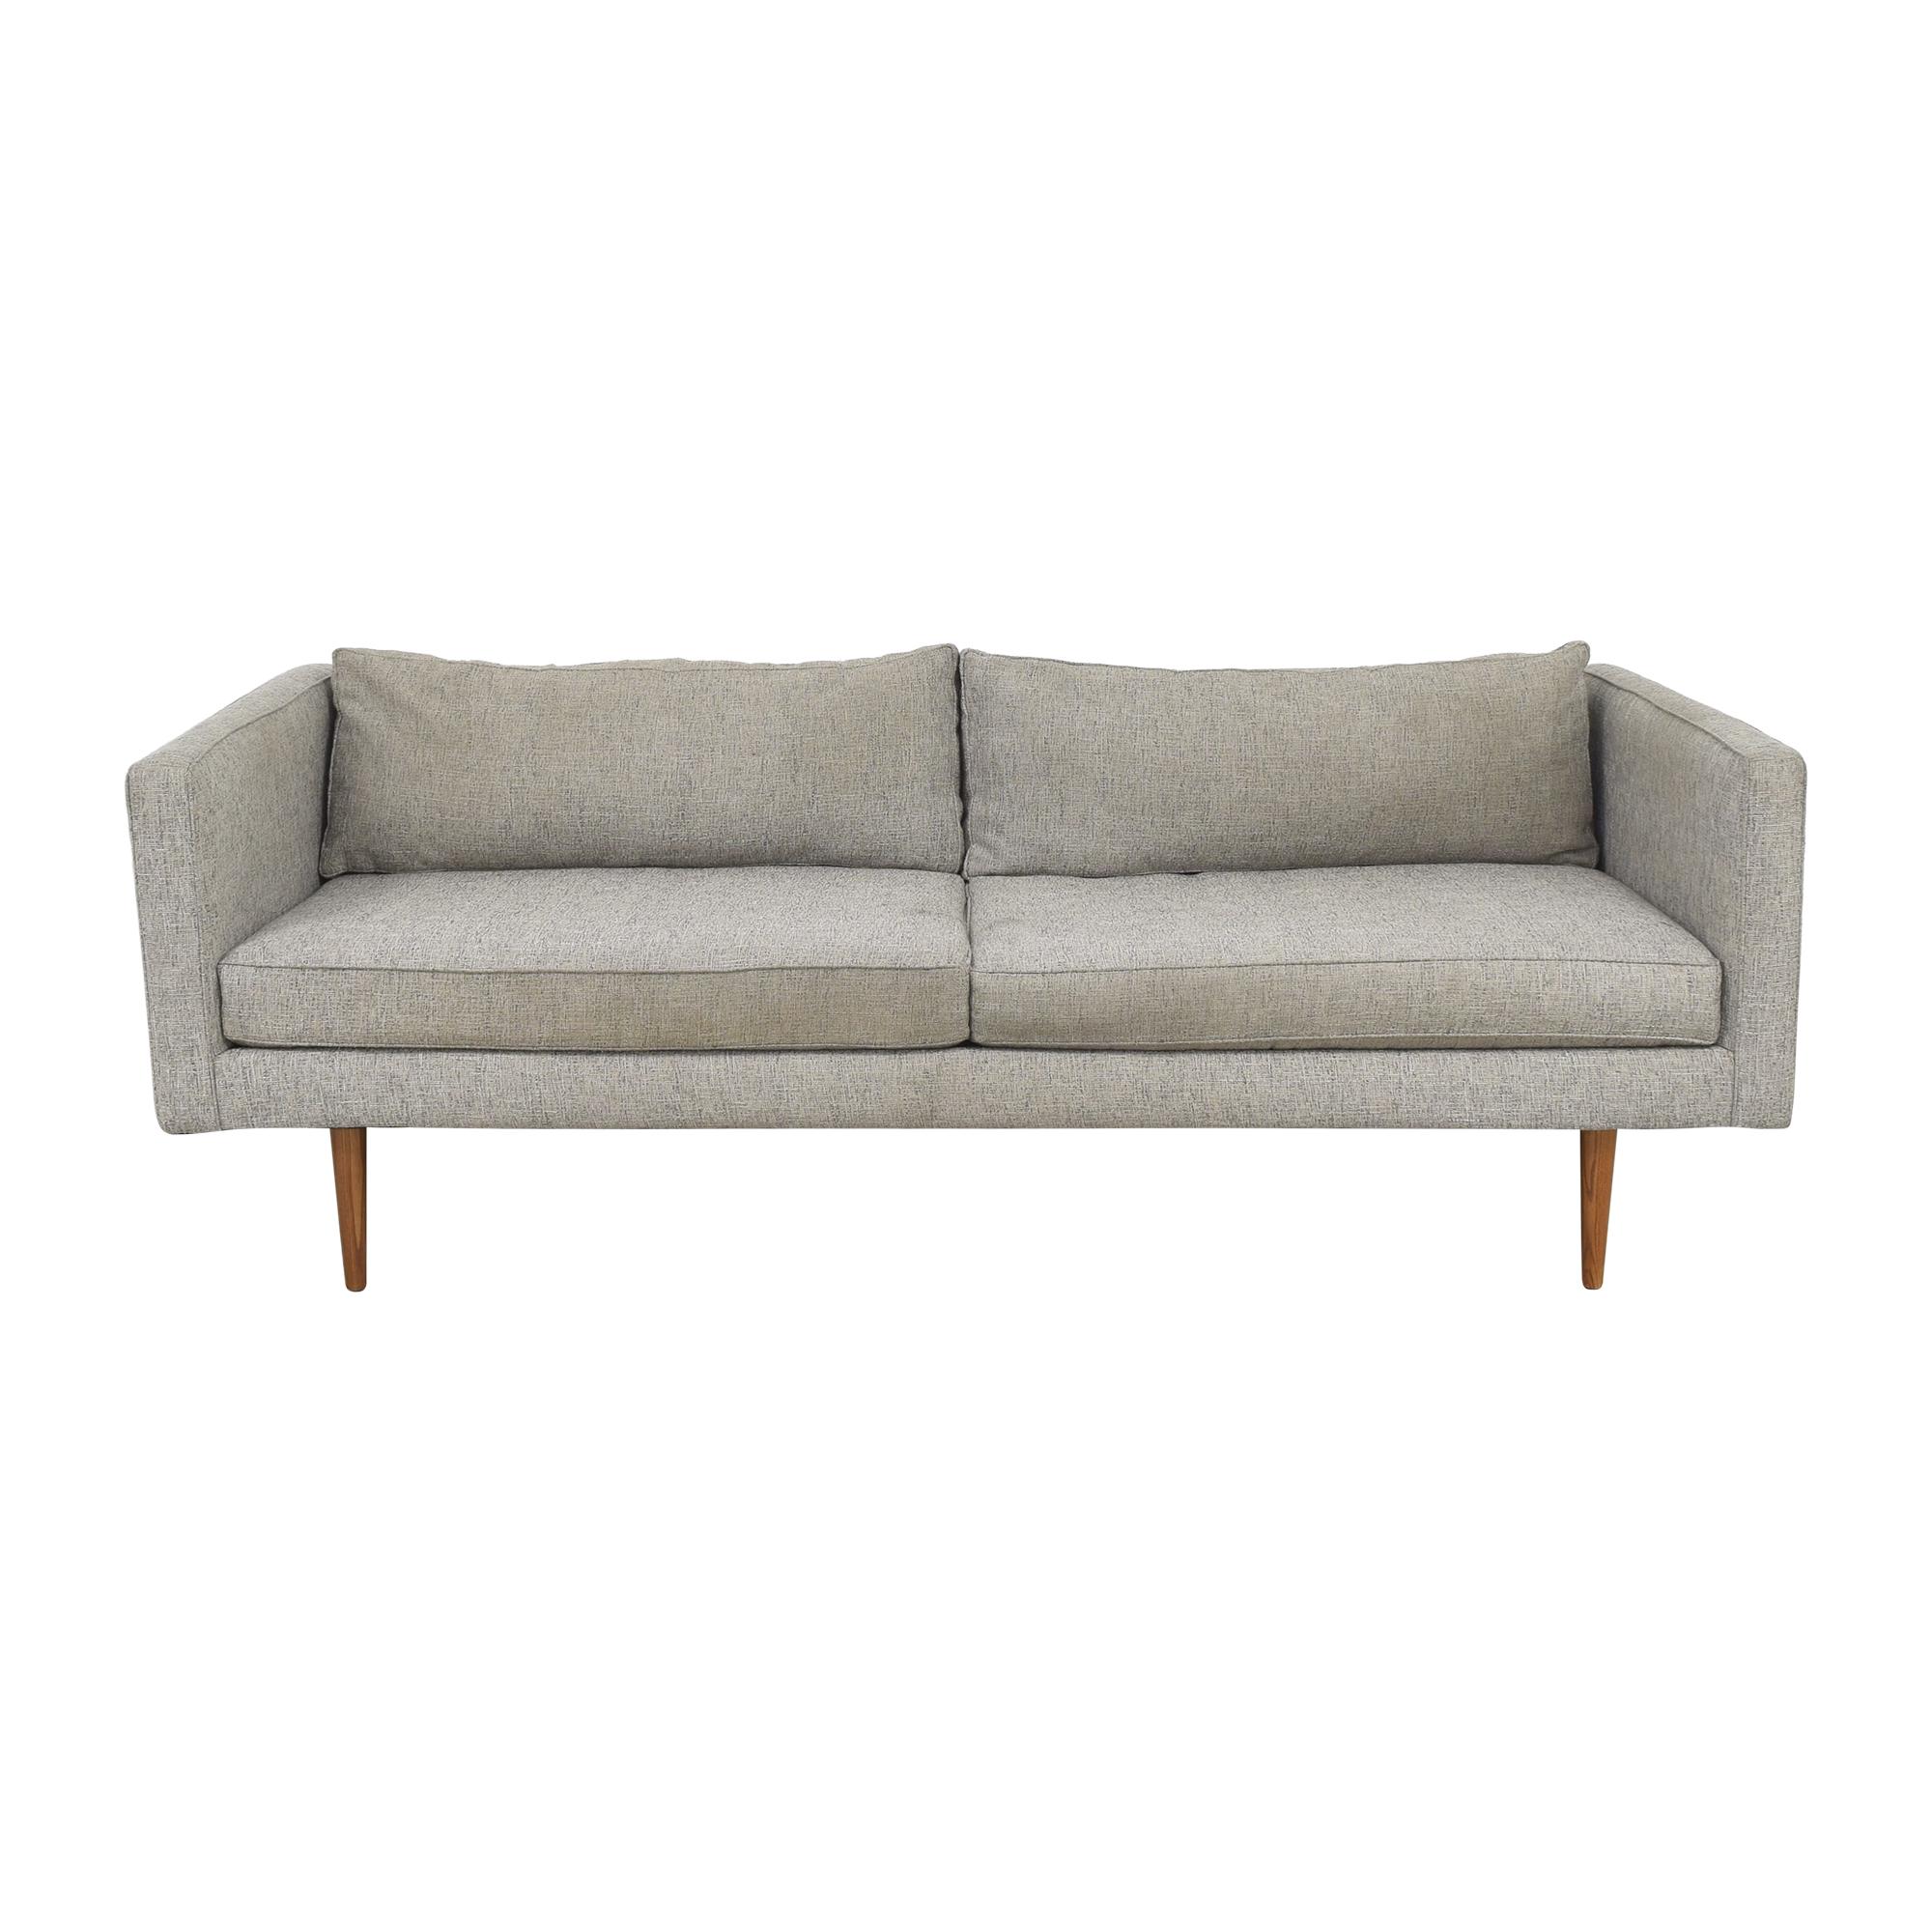 West Elm Monroe Mid Century Sofa / Classic Sofas